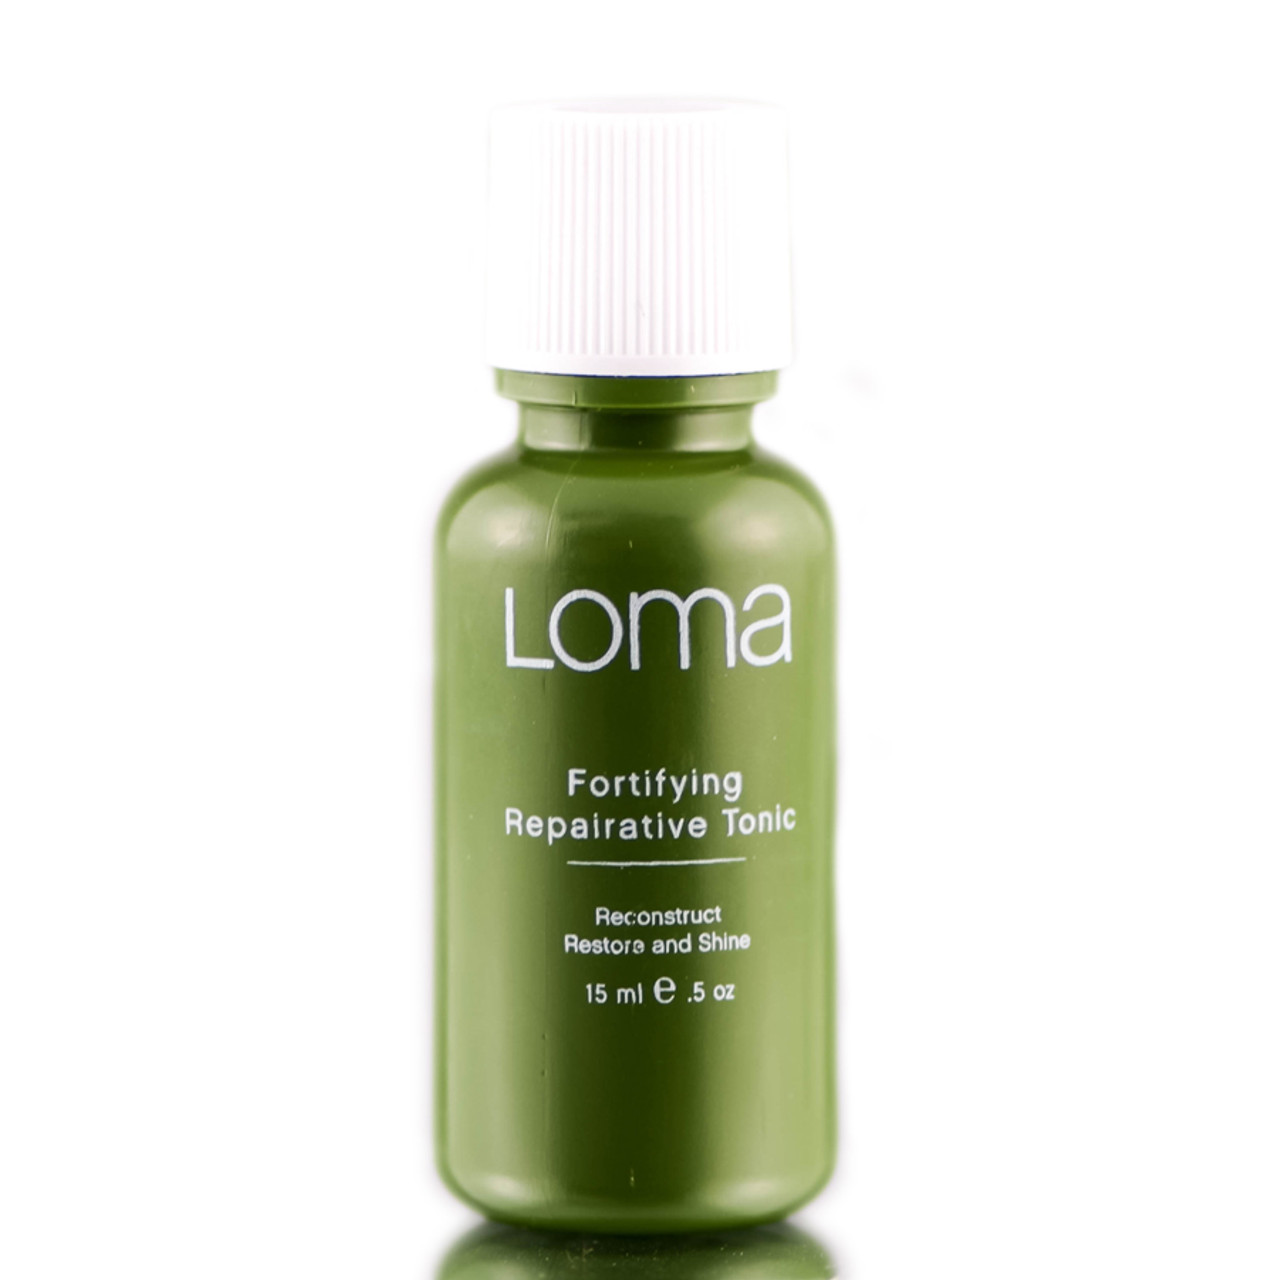 Loma Organics Fortifying Repairative Tonic Sleekshop Com Formerly Sleekhair